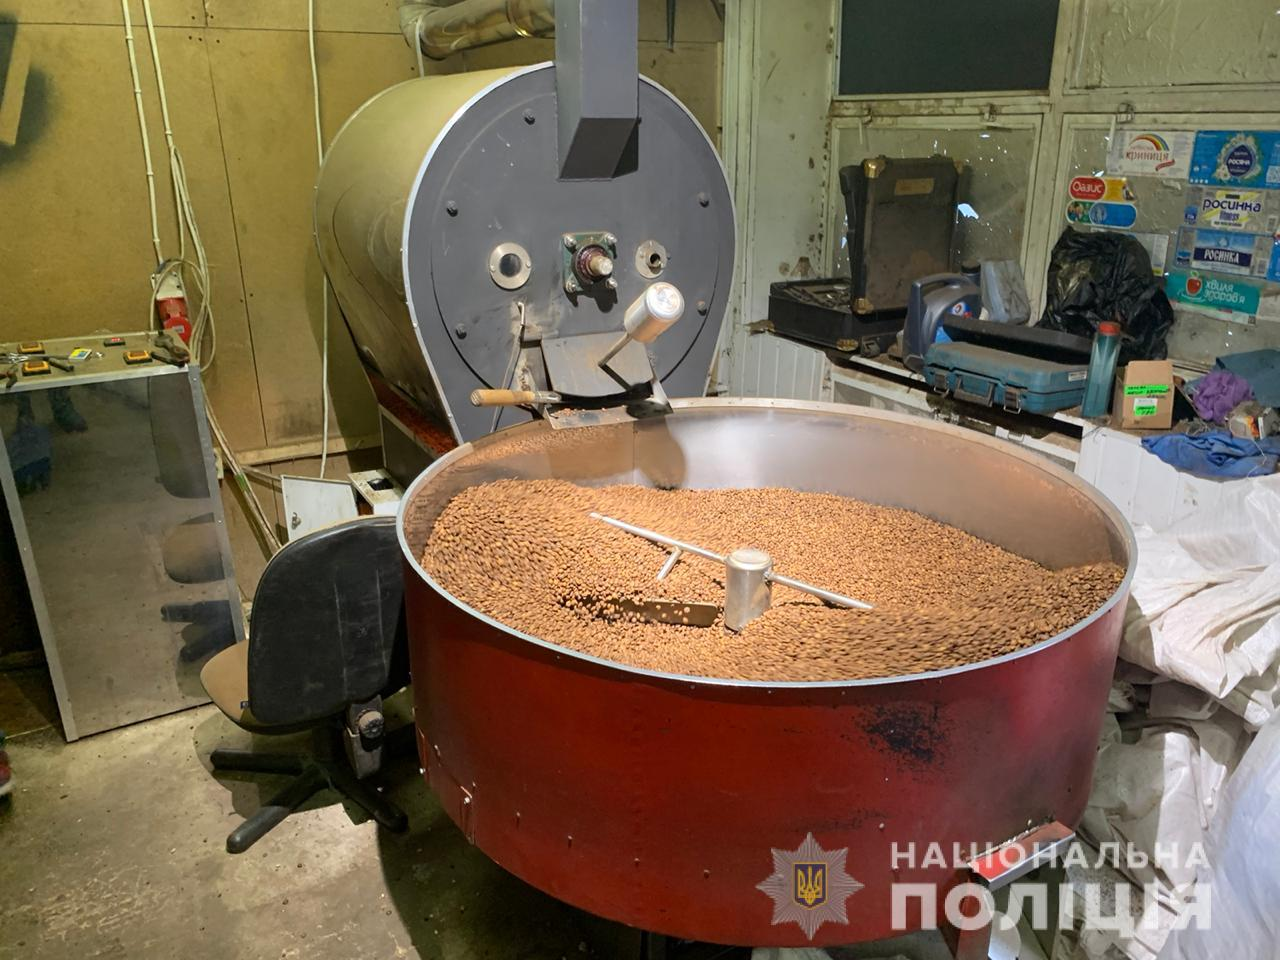 Нелегальна кава по-київськи: викрито підпільне виробництво - кава, бренди - 18.11.20cyberpolice